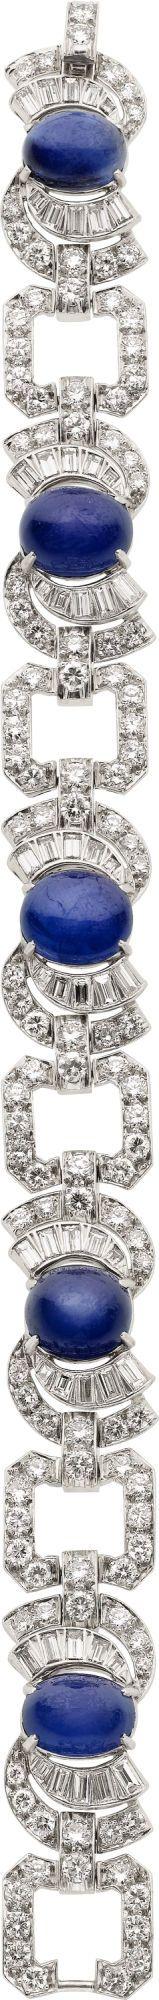 Art Deco Star Sapphire, Diamond, Platinum Bracelet.